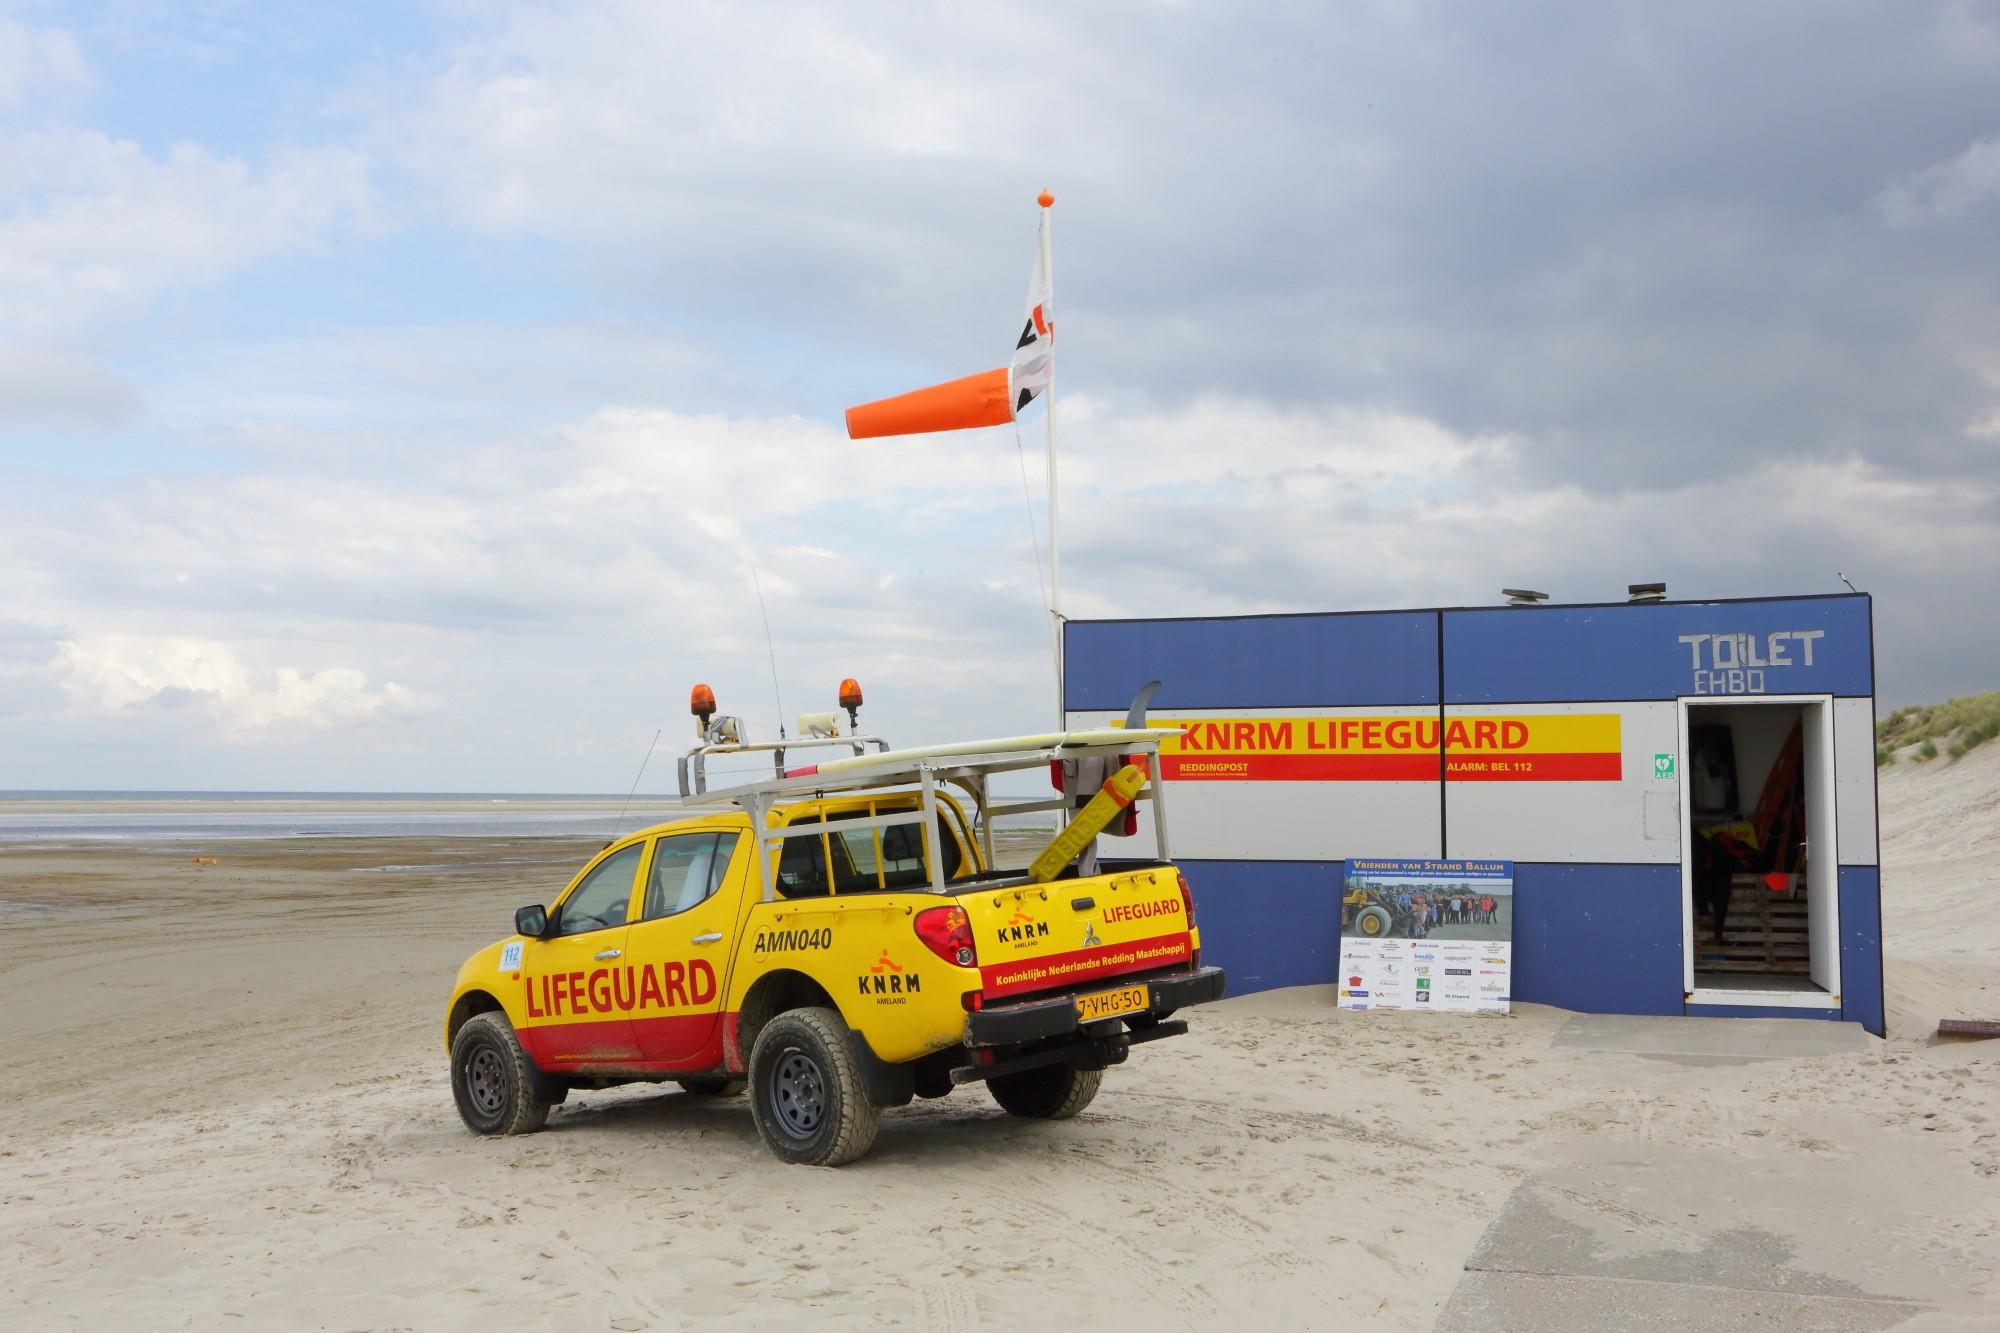 Marokkaanse Lampen Xenos : Knrm opzoek naar lifeguards bootaanboot.nl